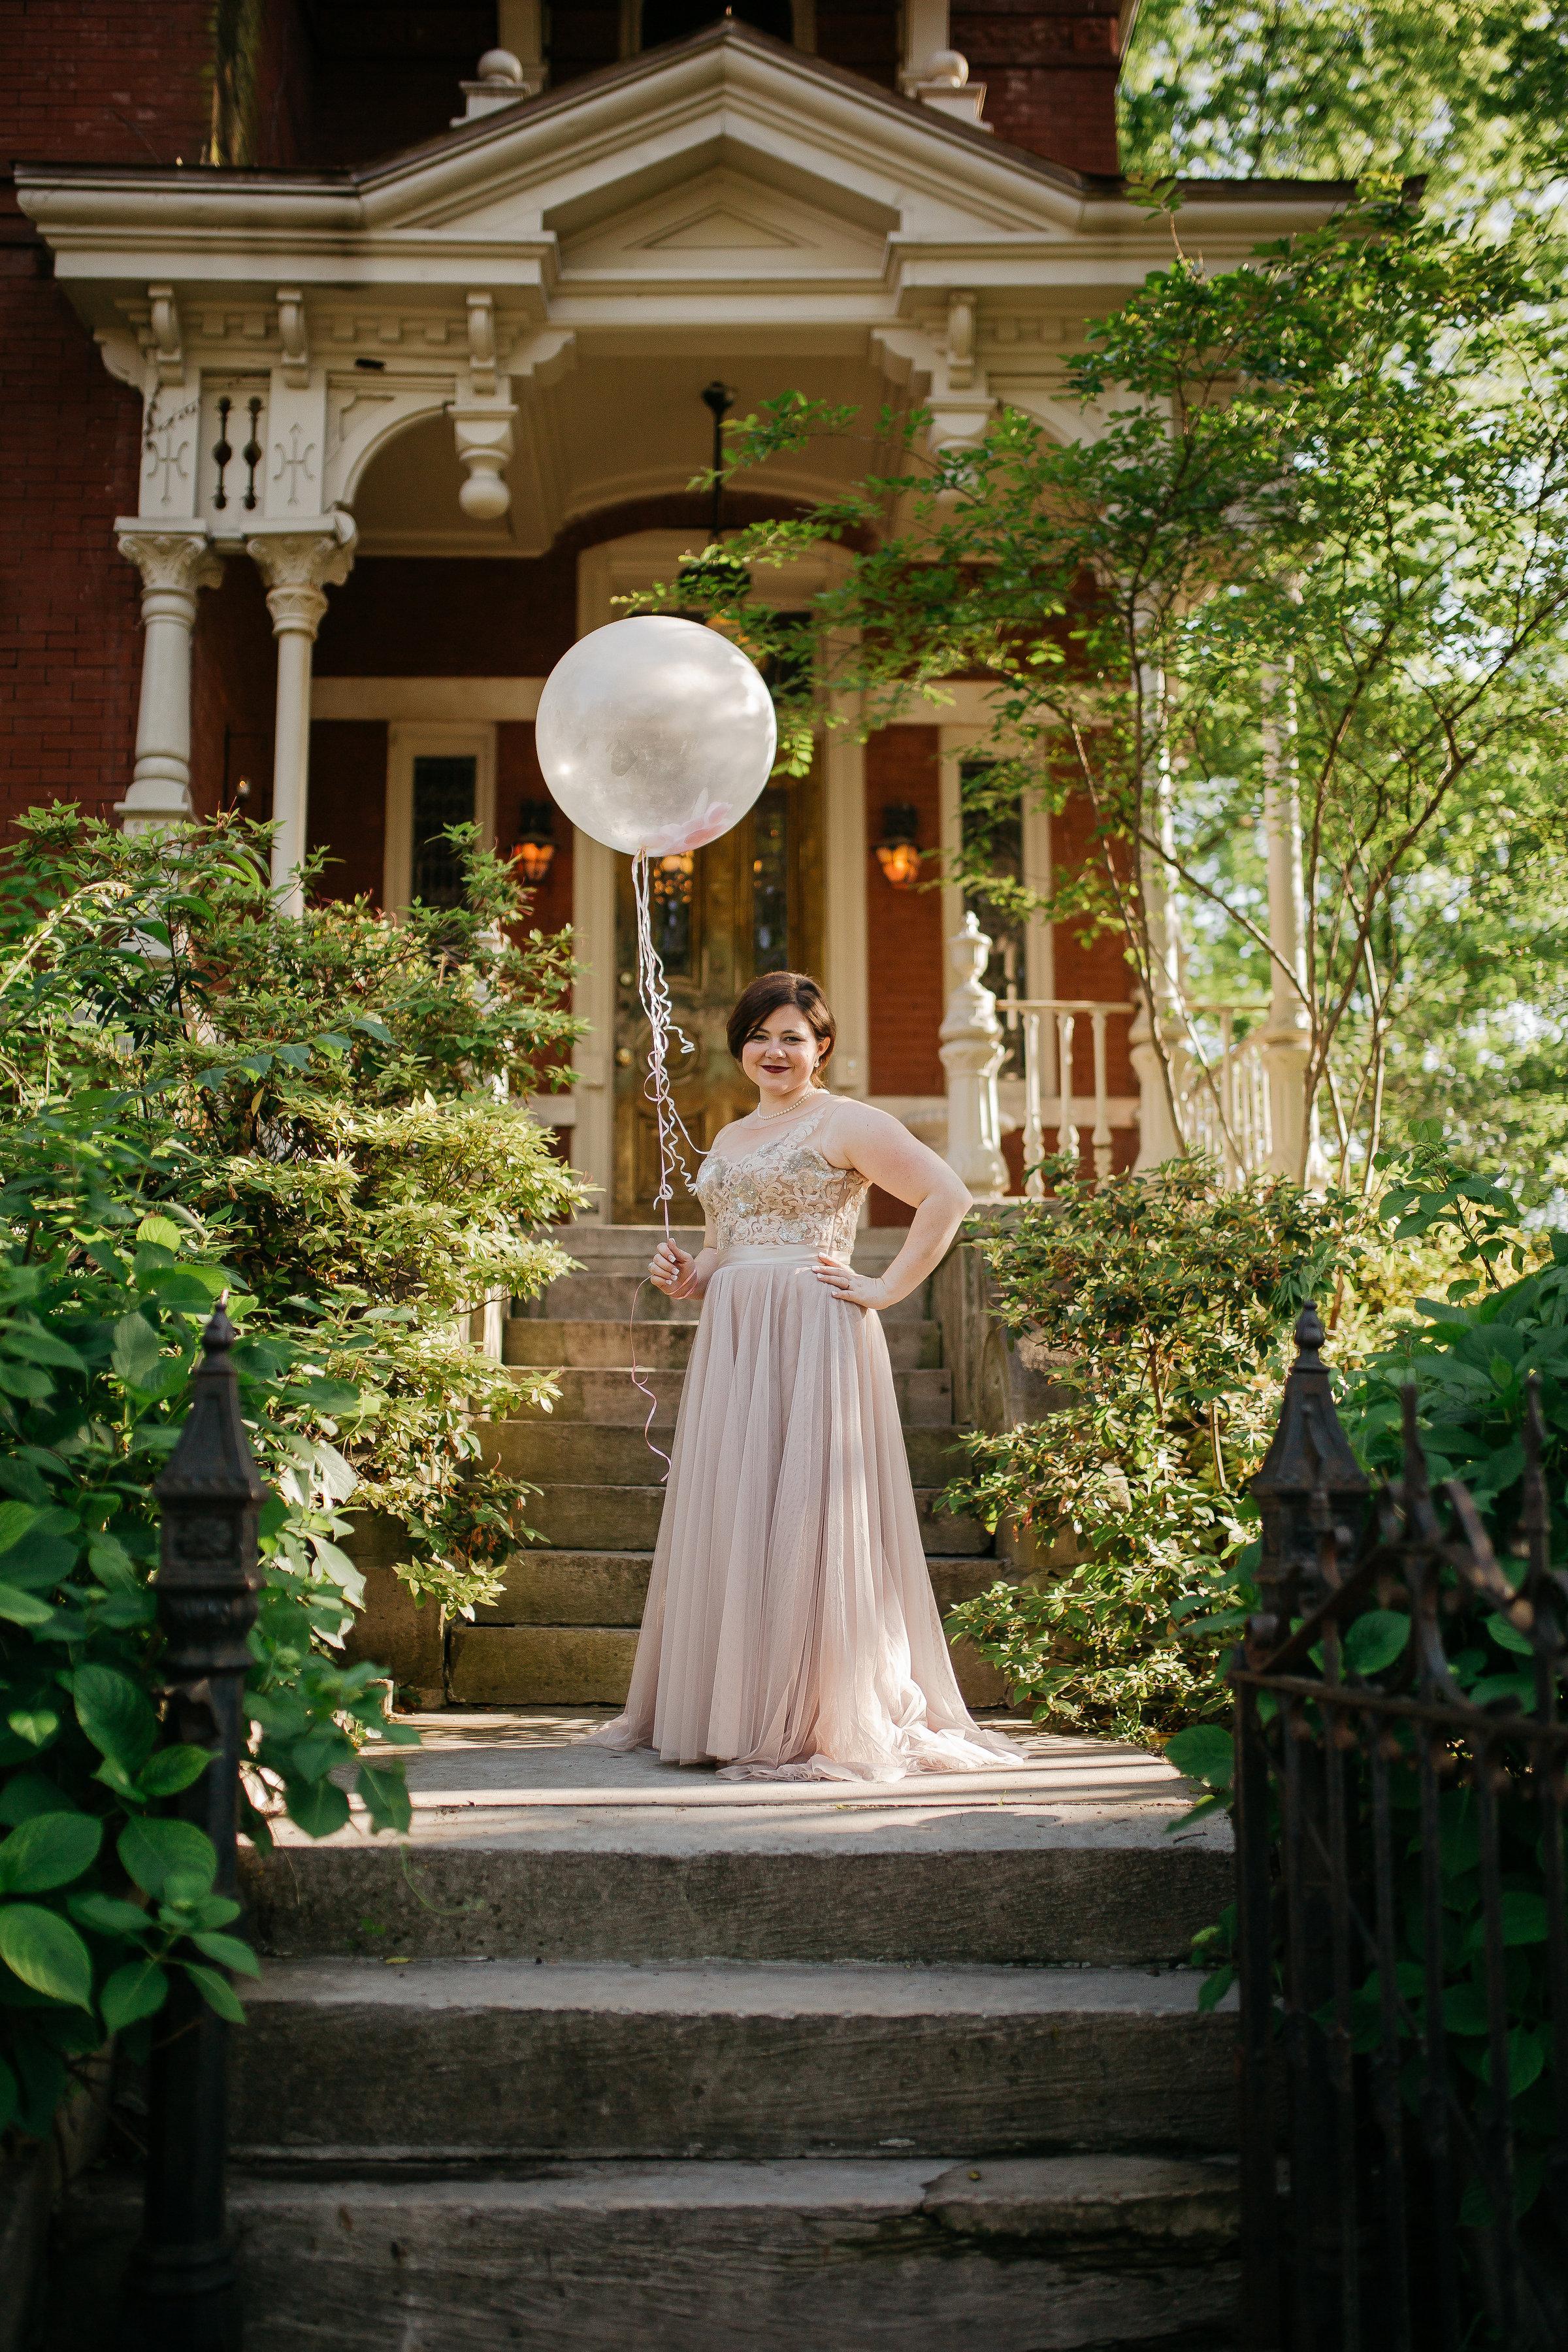 Memphis-Wedding-Planner-Wedding-Day-Manager-Florist-Wedding-Designer-Wedding-Coordinator- Floral-Curator-Kelsey-Connor-The-Hatches-Photography